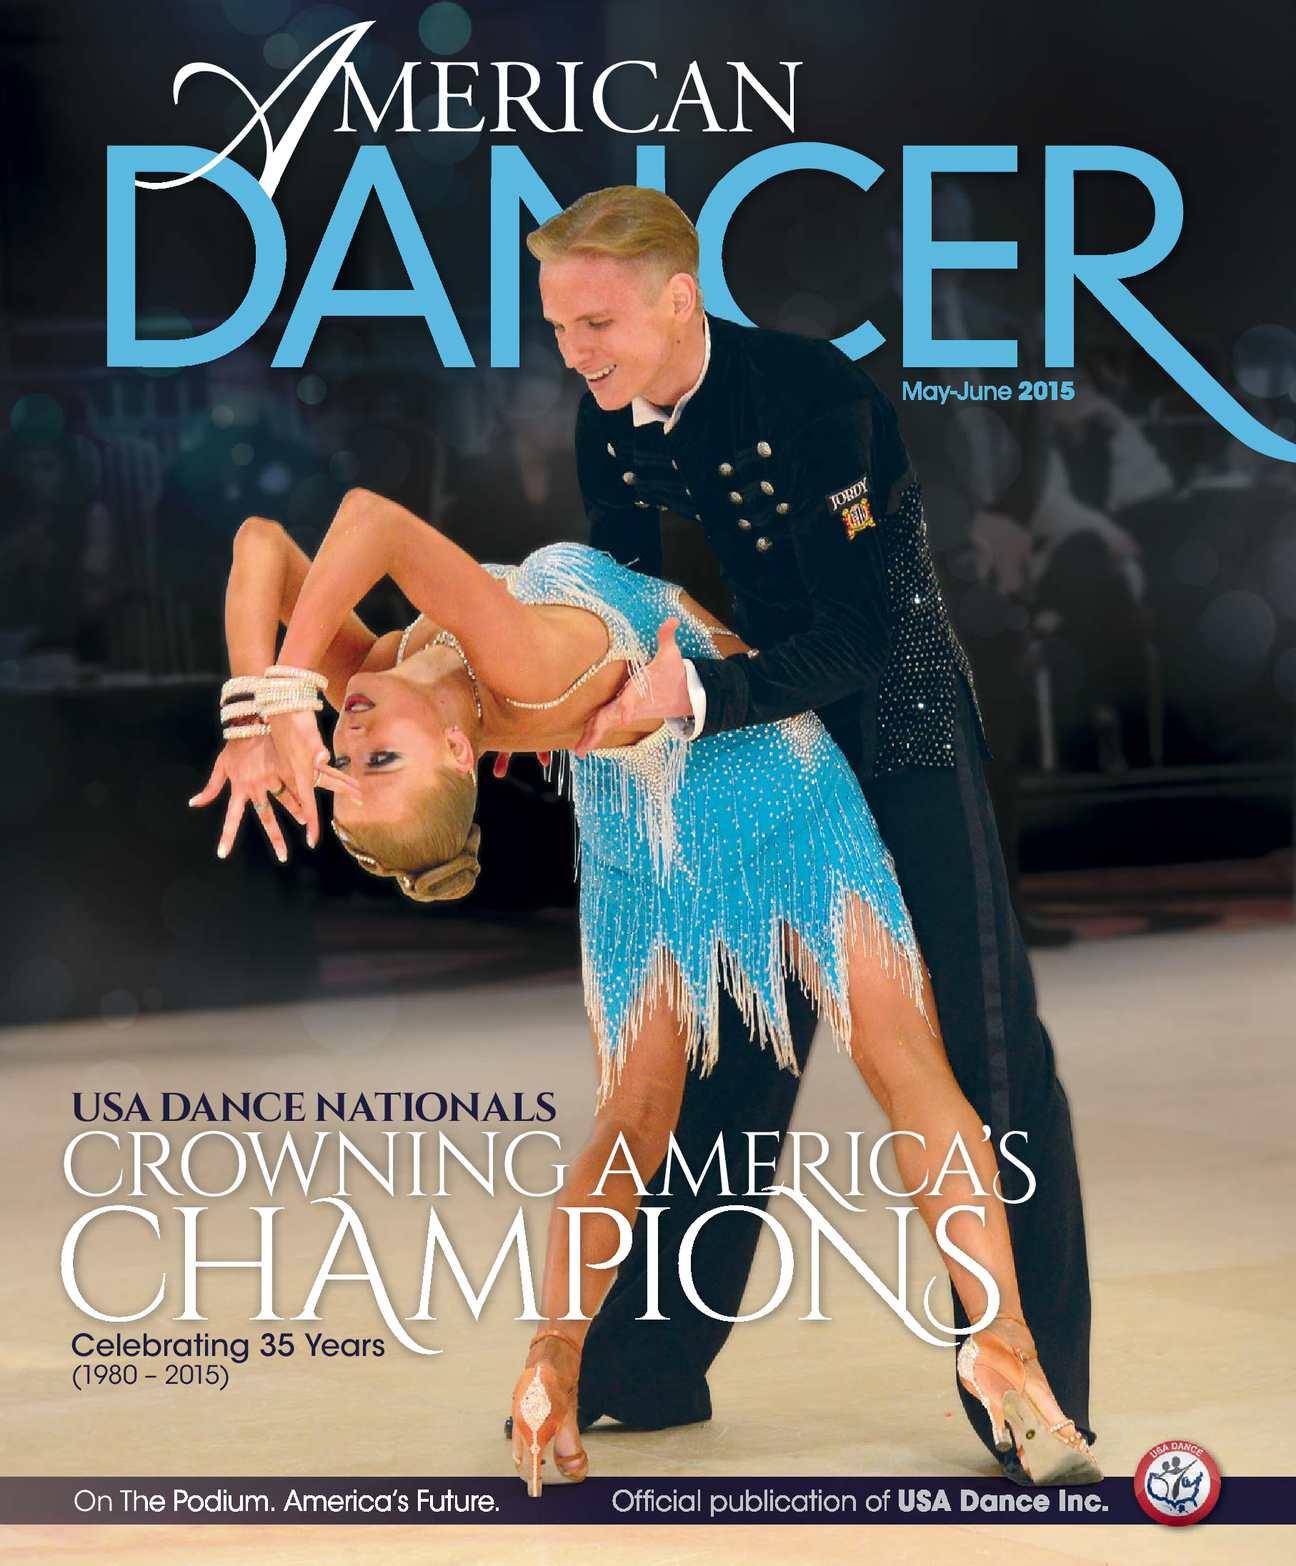 Calamo American Dancer Magazine May June 2015 Issue Sound Source Locator Uses Prechamp